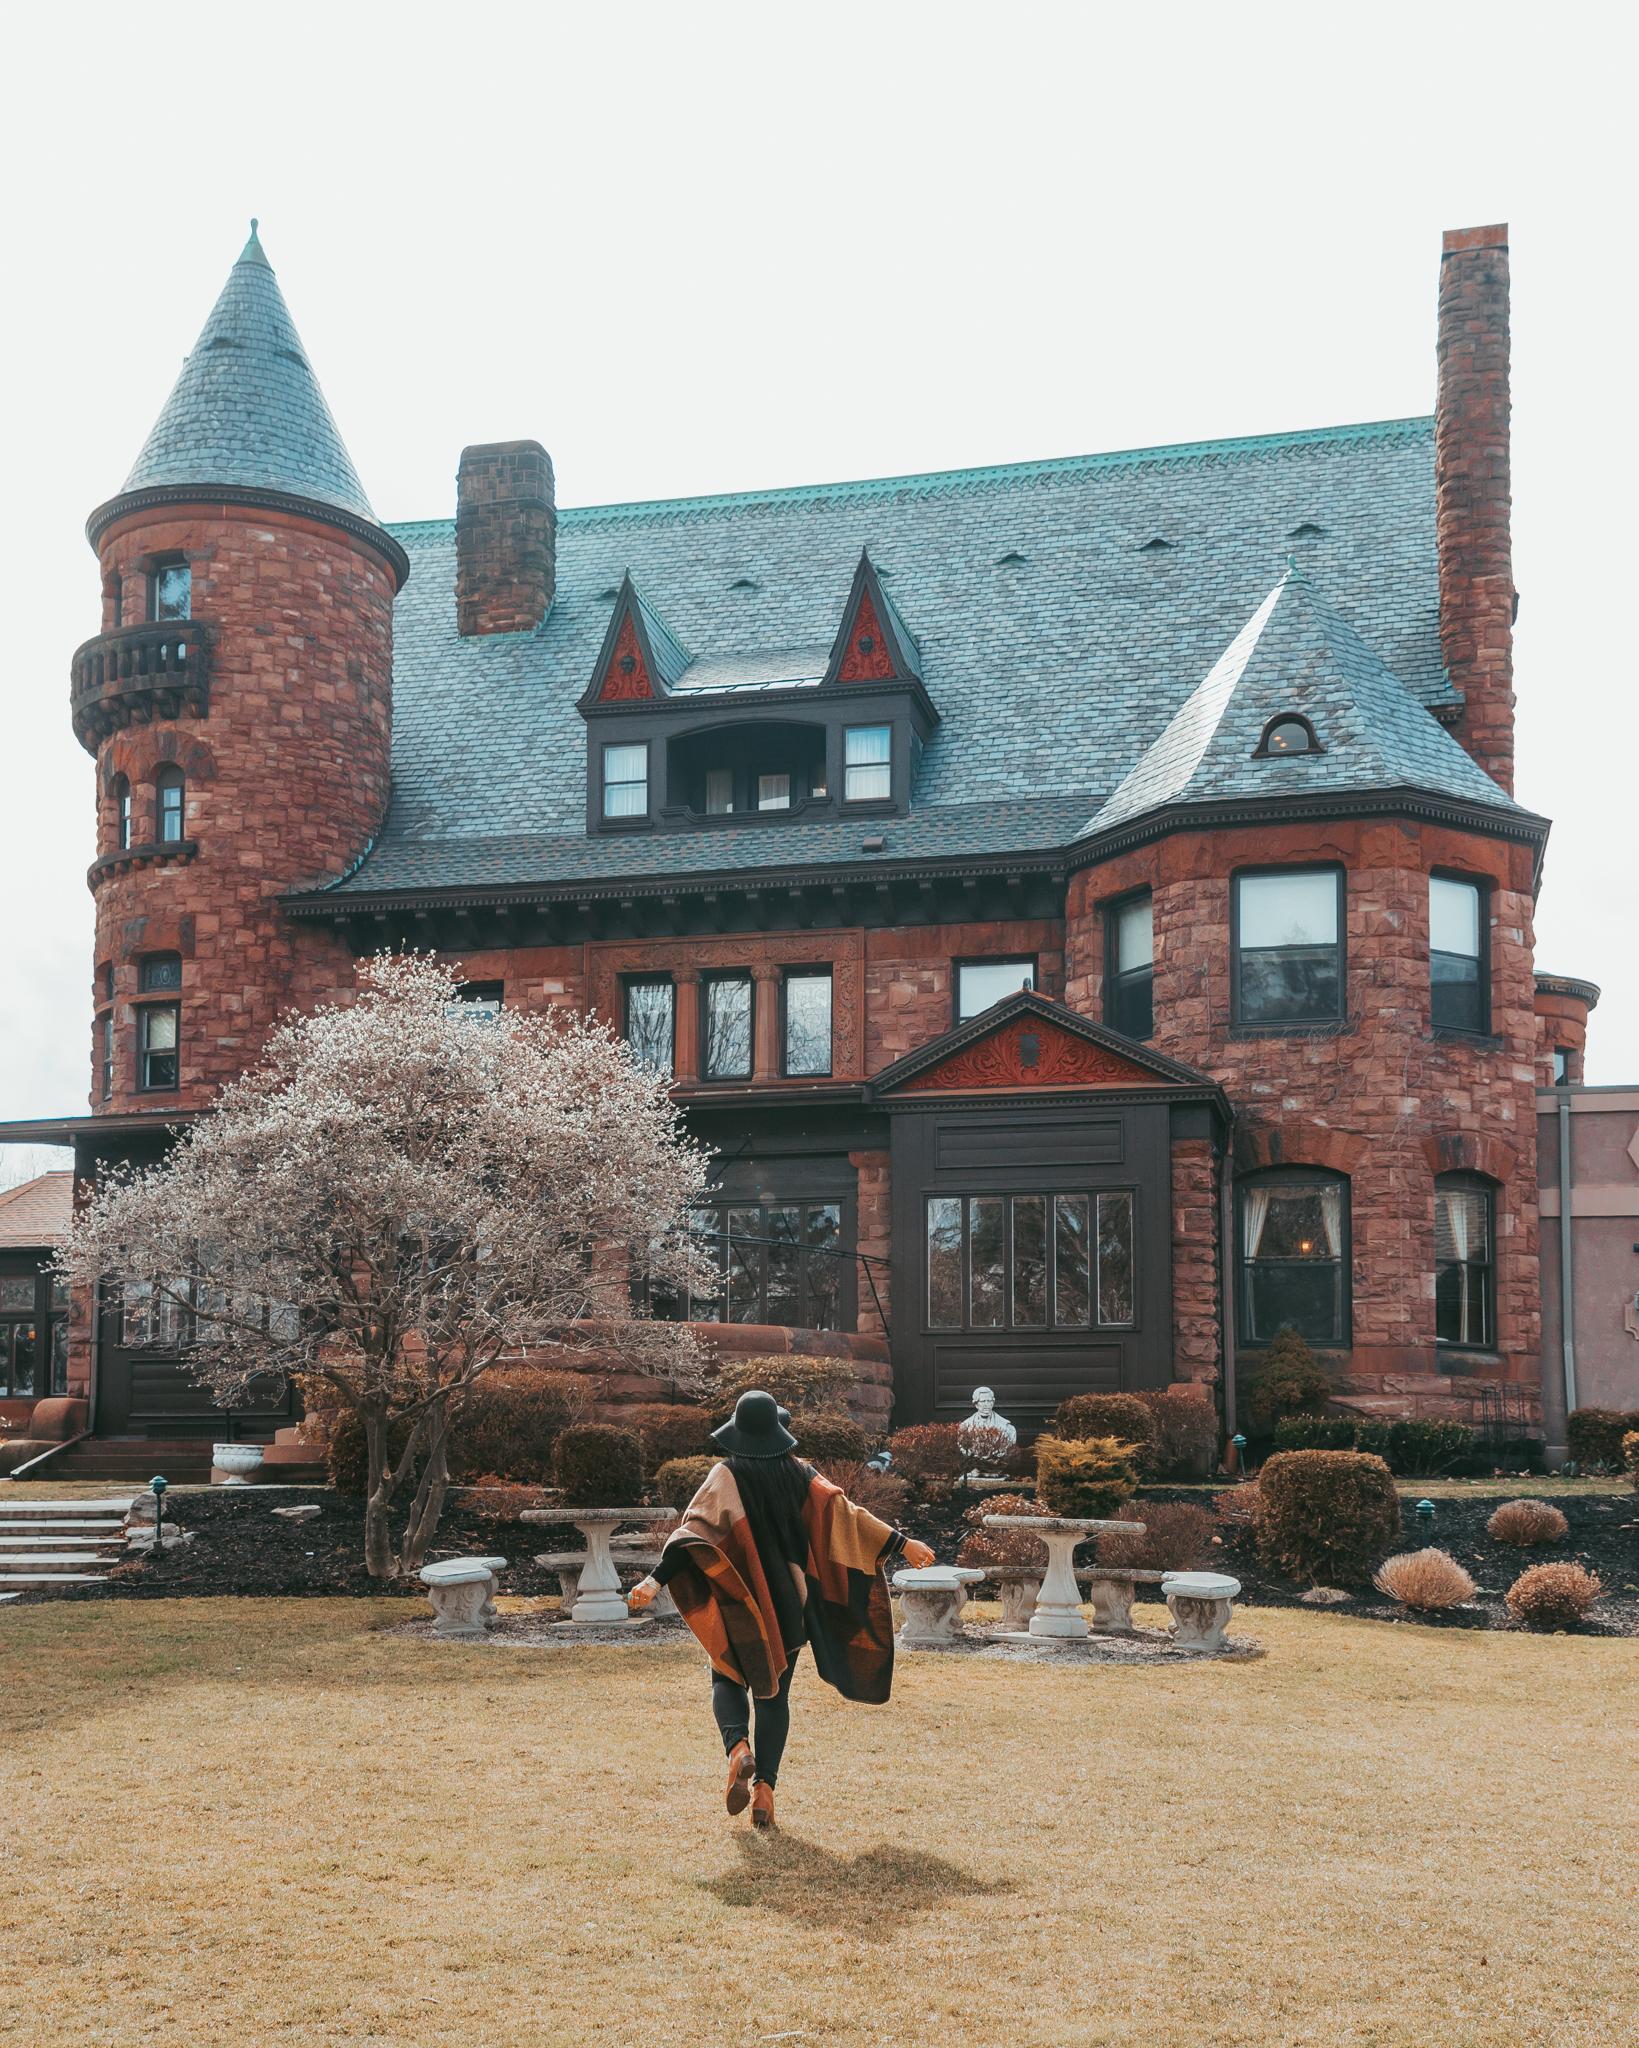 Belhurst Castle in Geneva, NY // 3 Days in the Finger Lakes: A Wine Trail Itinerary